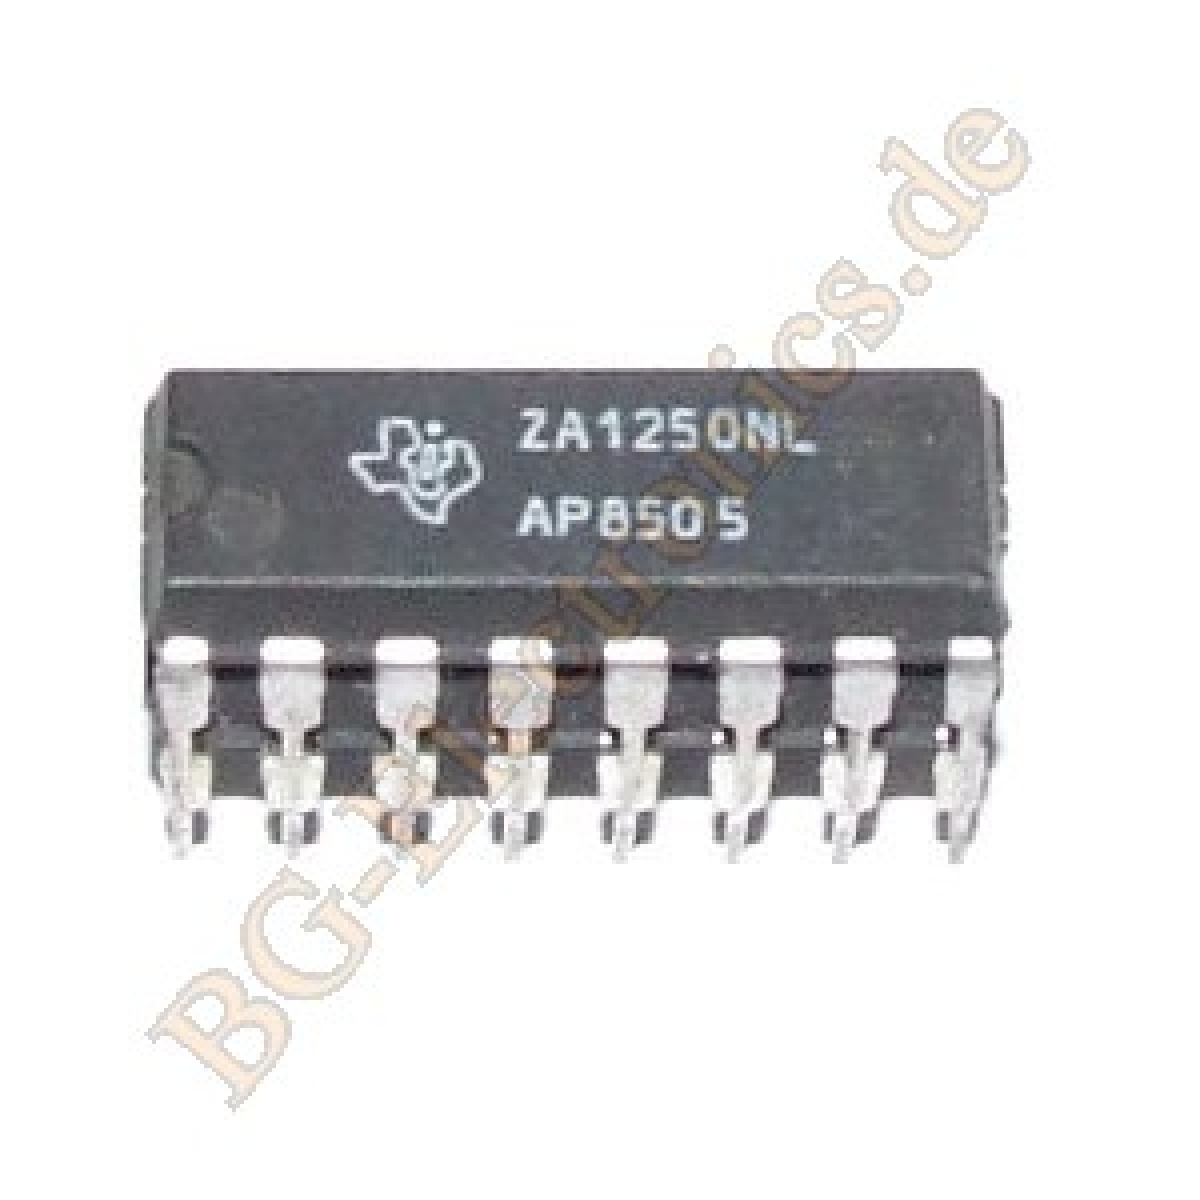 1PCS TMS4164-20NL Encapsulation:DIP-16,x1 Page Mode DRAM Manu:TI